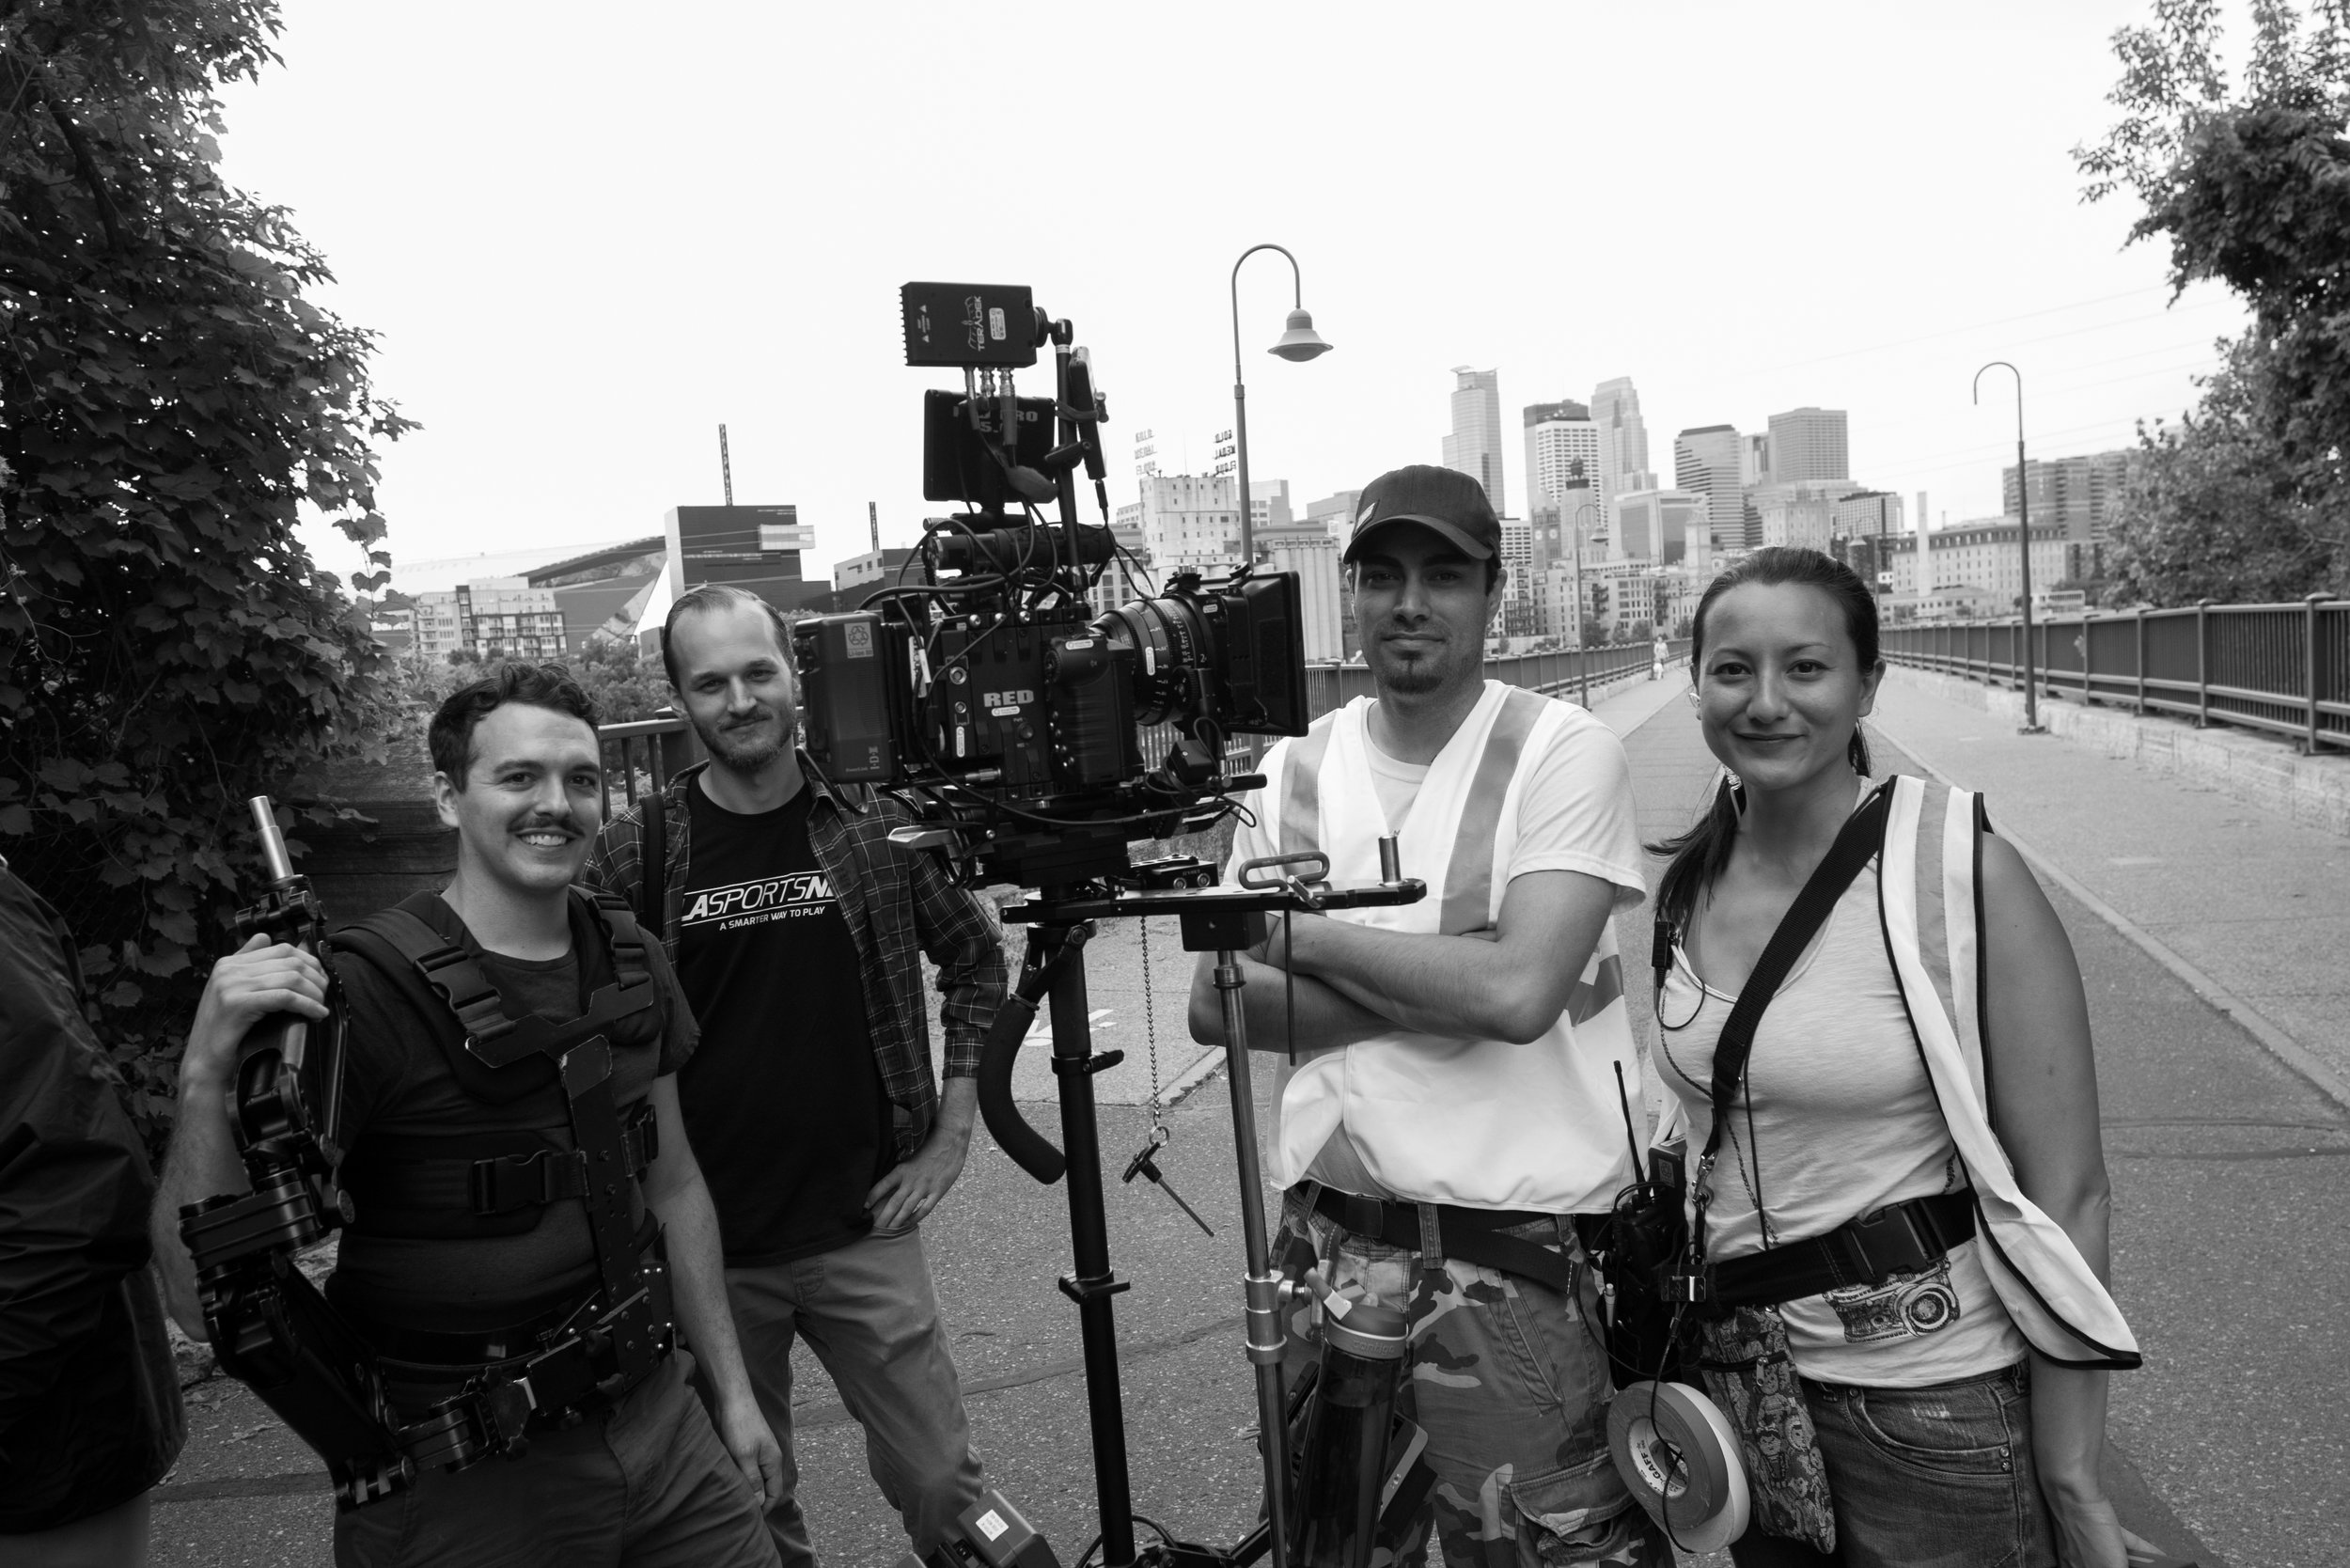 Camera Department Left to right: Jesse Meehl, Vaughn Potter, Mark Hobz, Frederique Imbert (me)